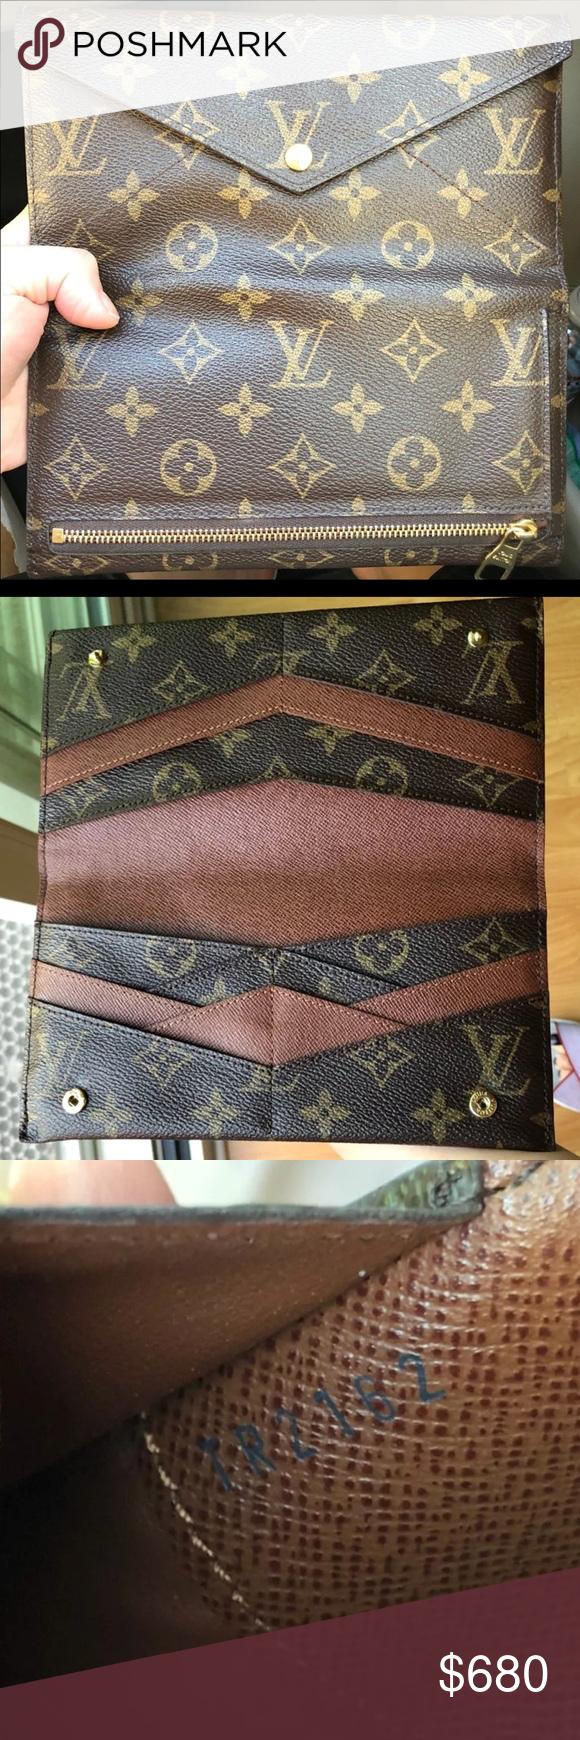 Lv Monogram Portefeuille Origami Wallet In 2018 My Posh Picks